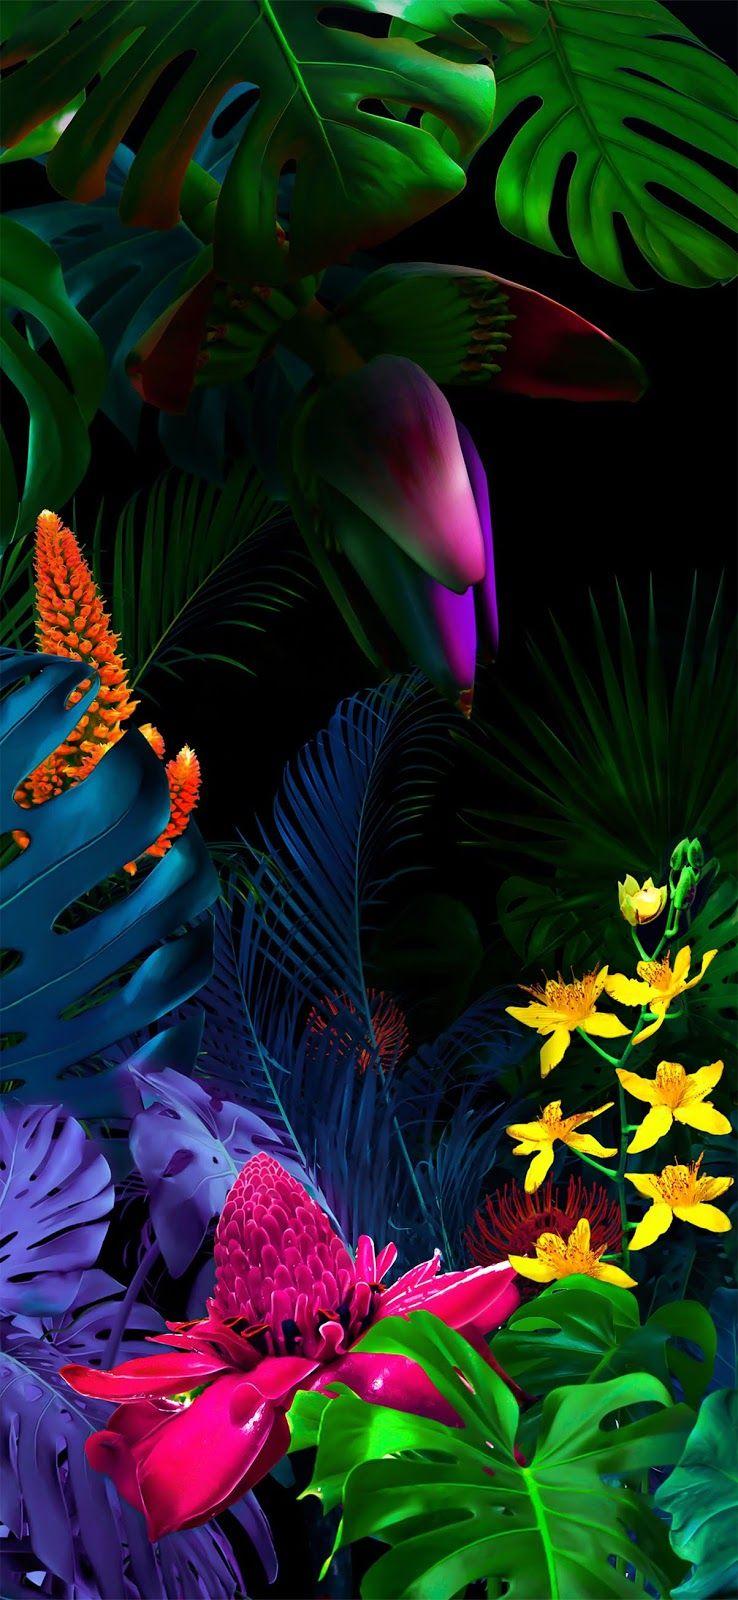 Lg G8 Wallpaper Floral Wallpaper Desktop Samsung Wallpaper Flower Wallpaper